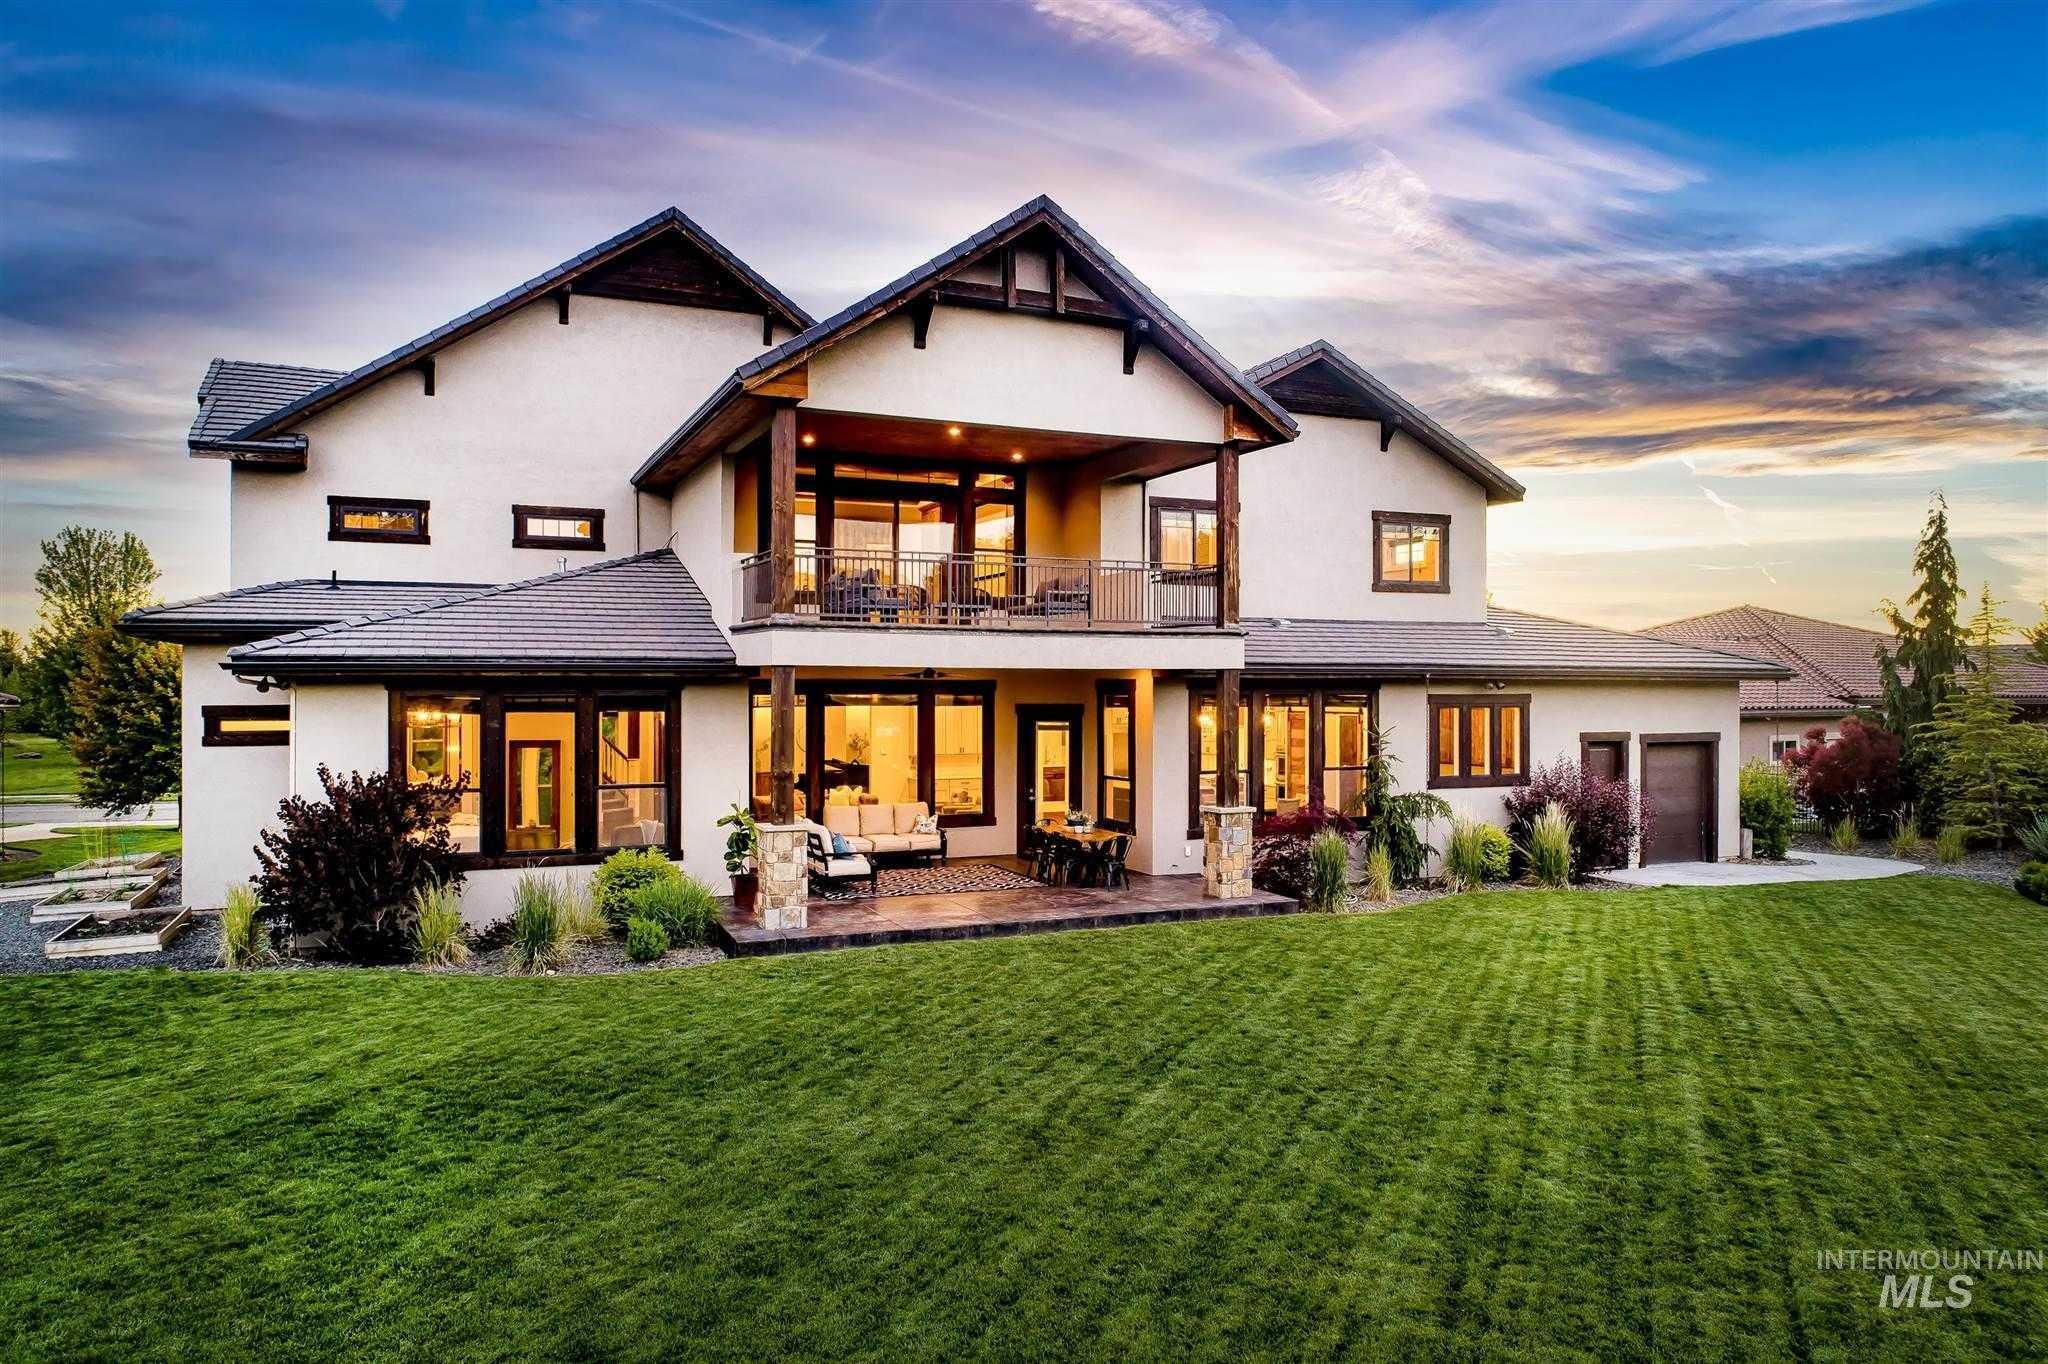 $3,345,000 - 9Br/7Ba -  for Sale in Spurwing Greens Estates, Meridian